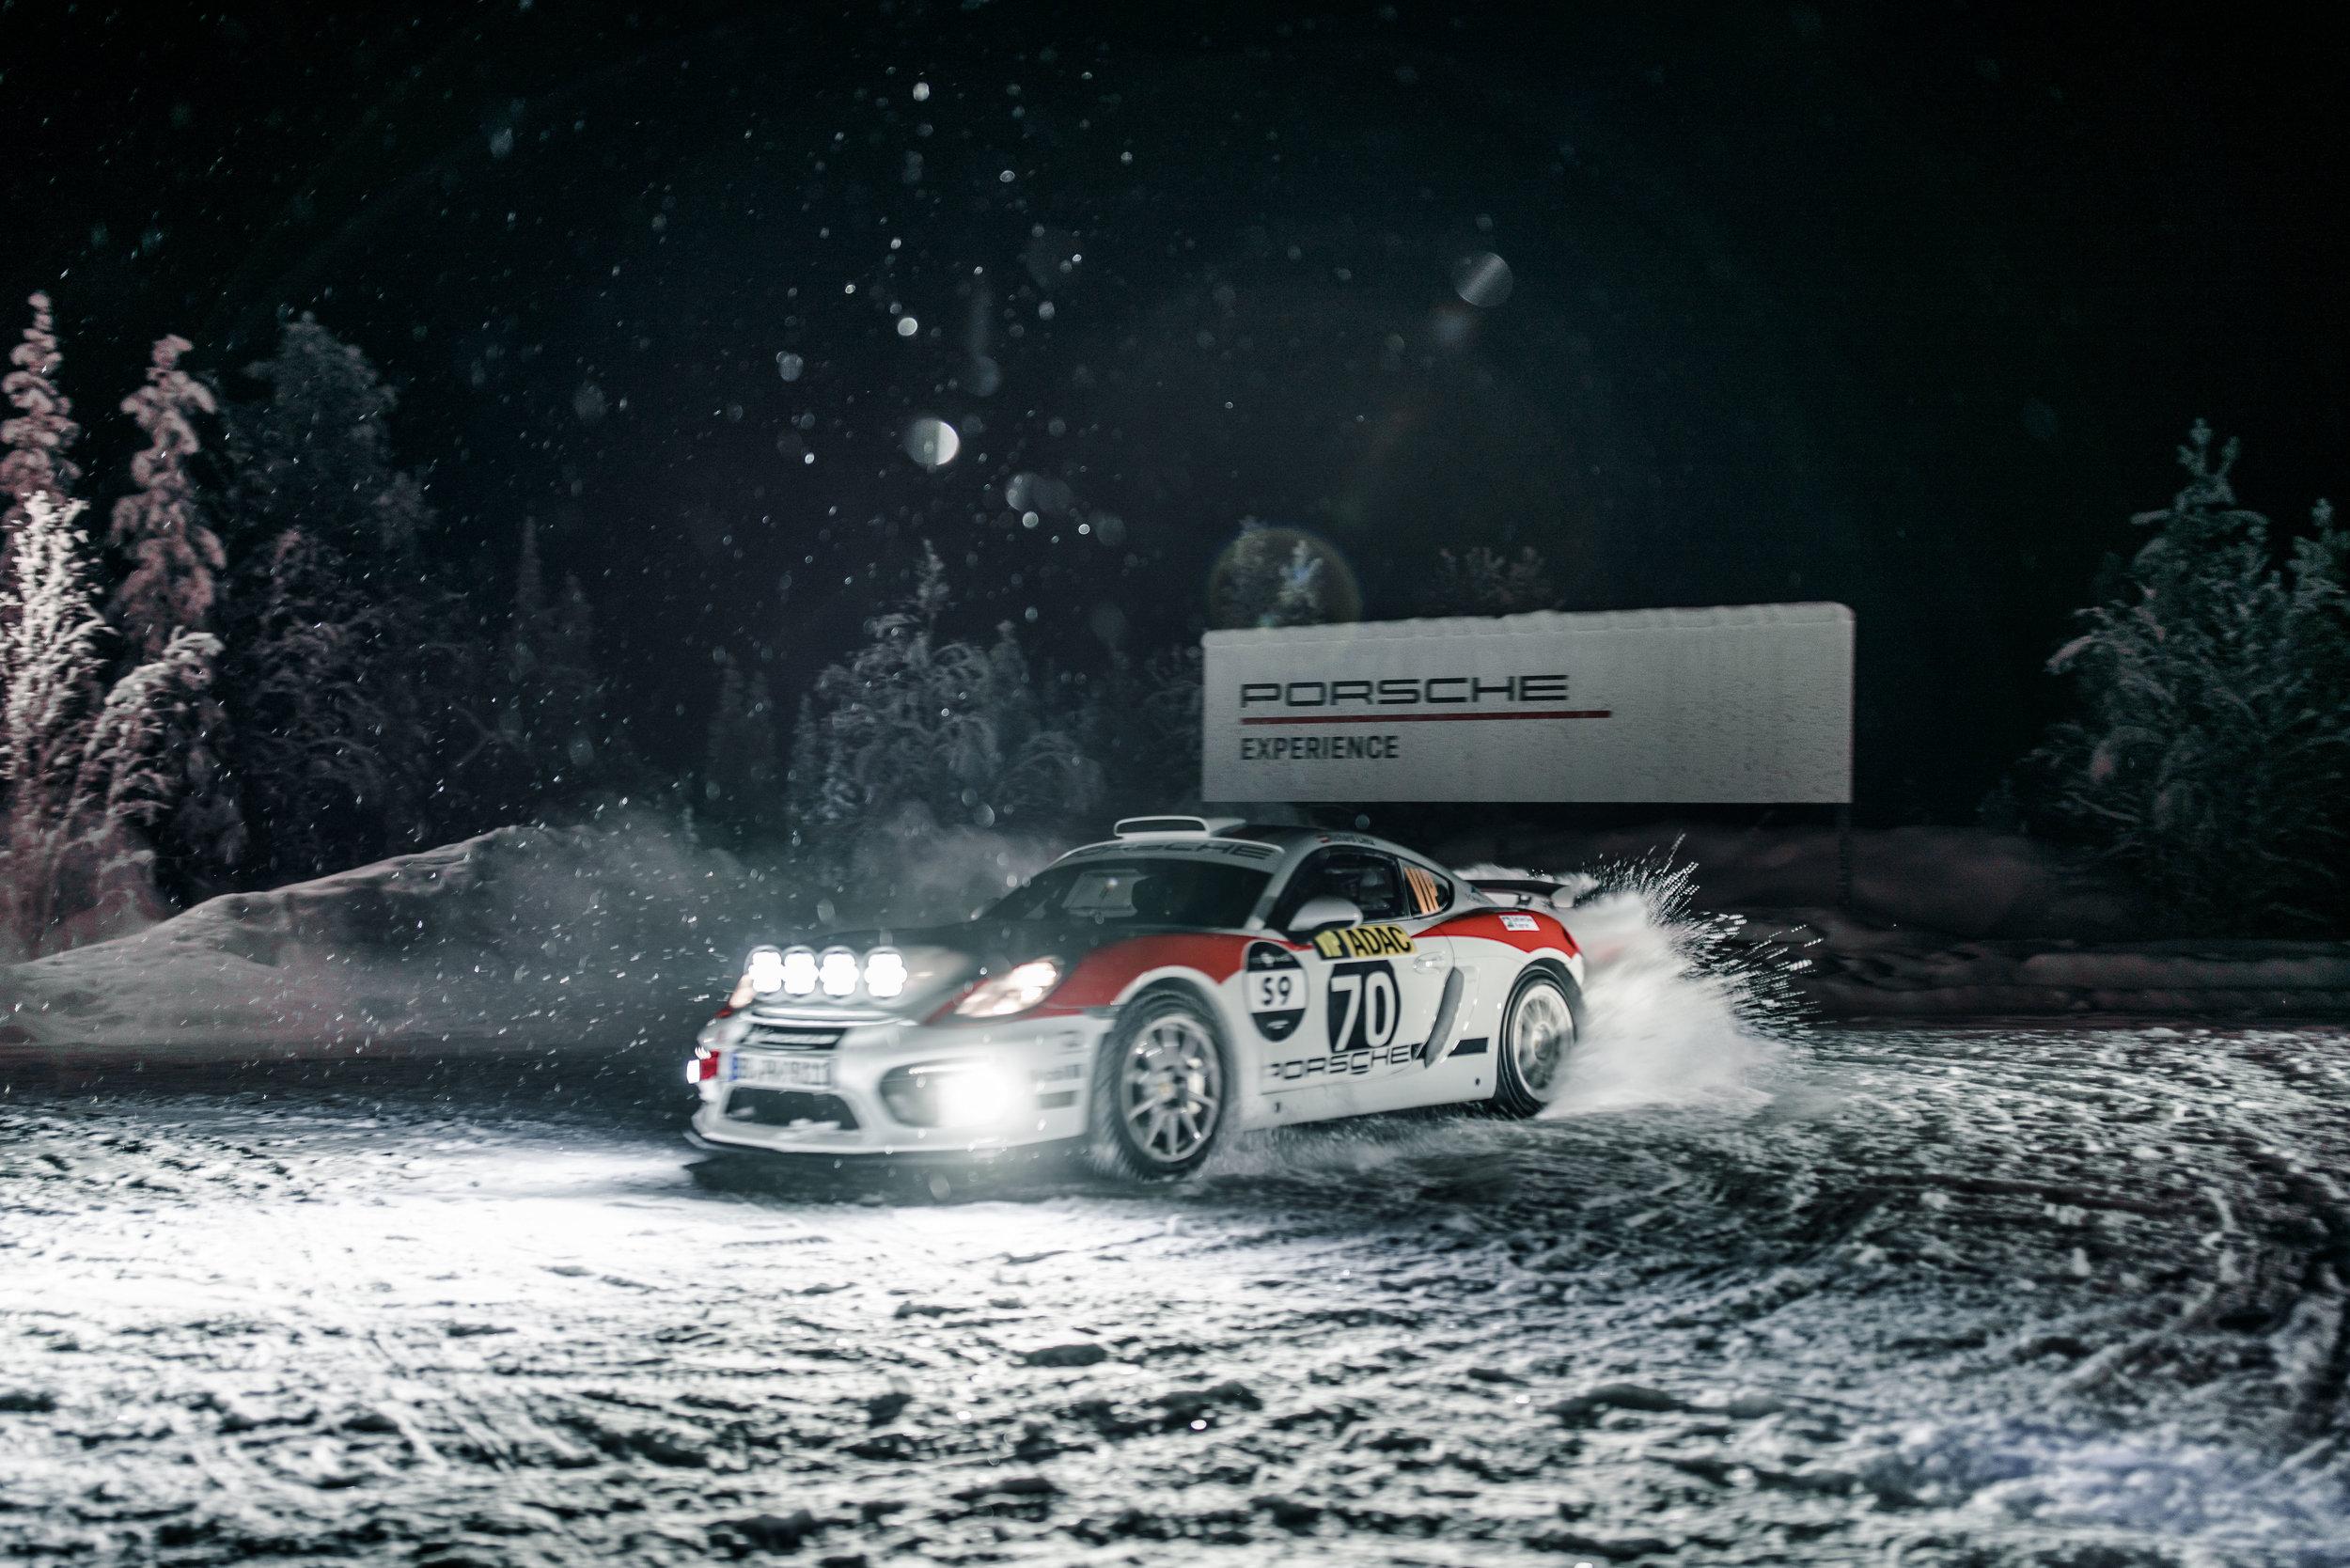 Porsche Ice Experience on Ice_30_01_2019_0707_175720.jpg